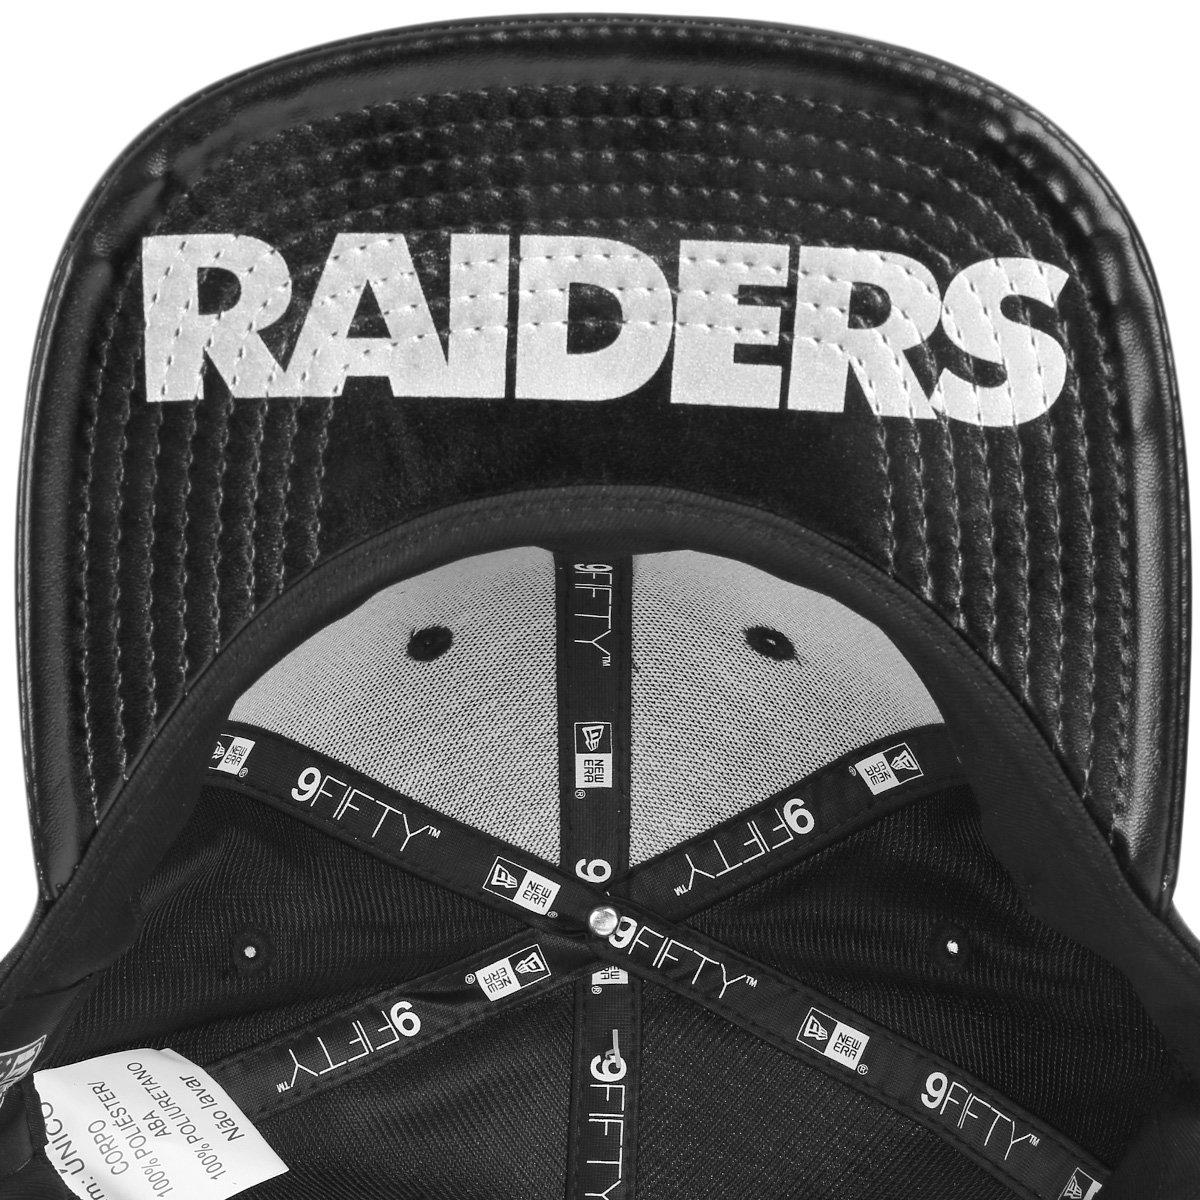 19c072472e5e0 ... Boné New Era NFL Oakland Raiders Aba Reta 950 Original Fit Sn On Stage  Masculino -. NIVER 18  OFERTAS  OPEC